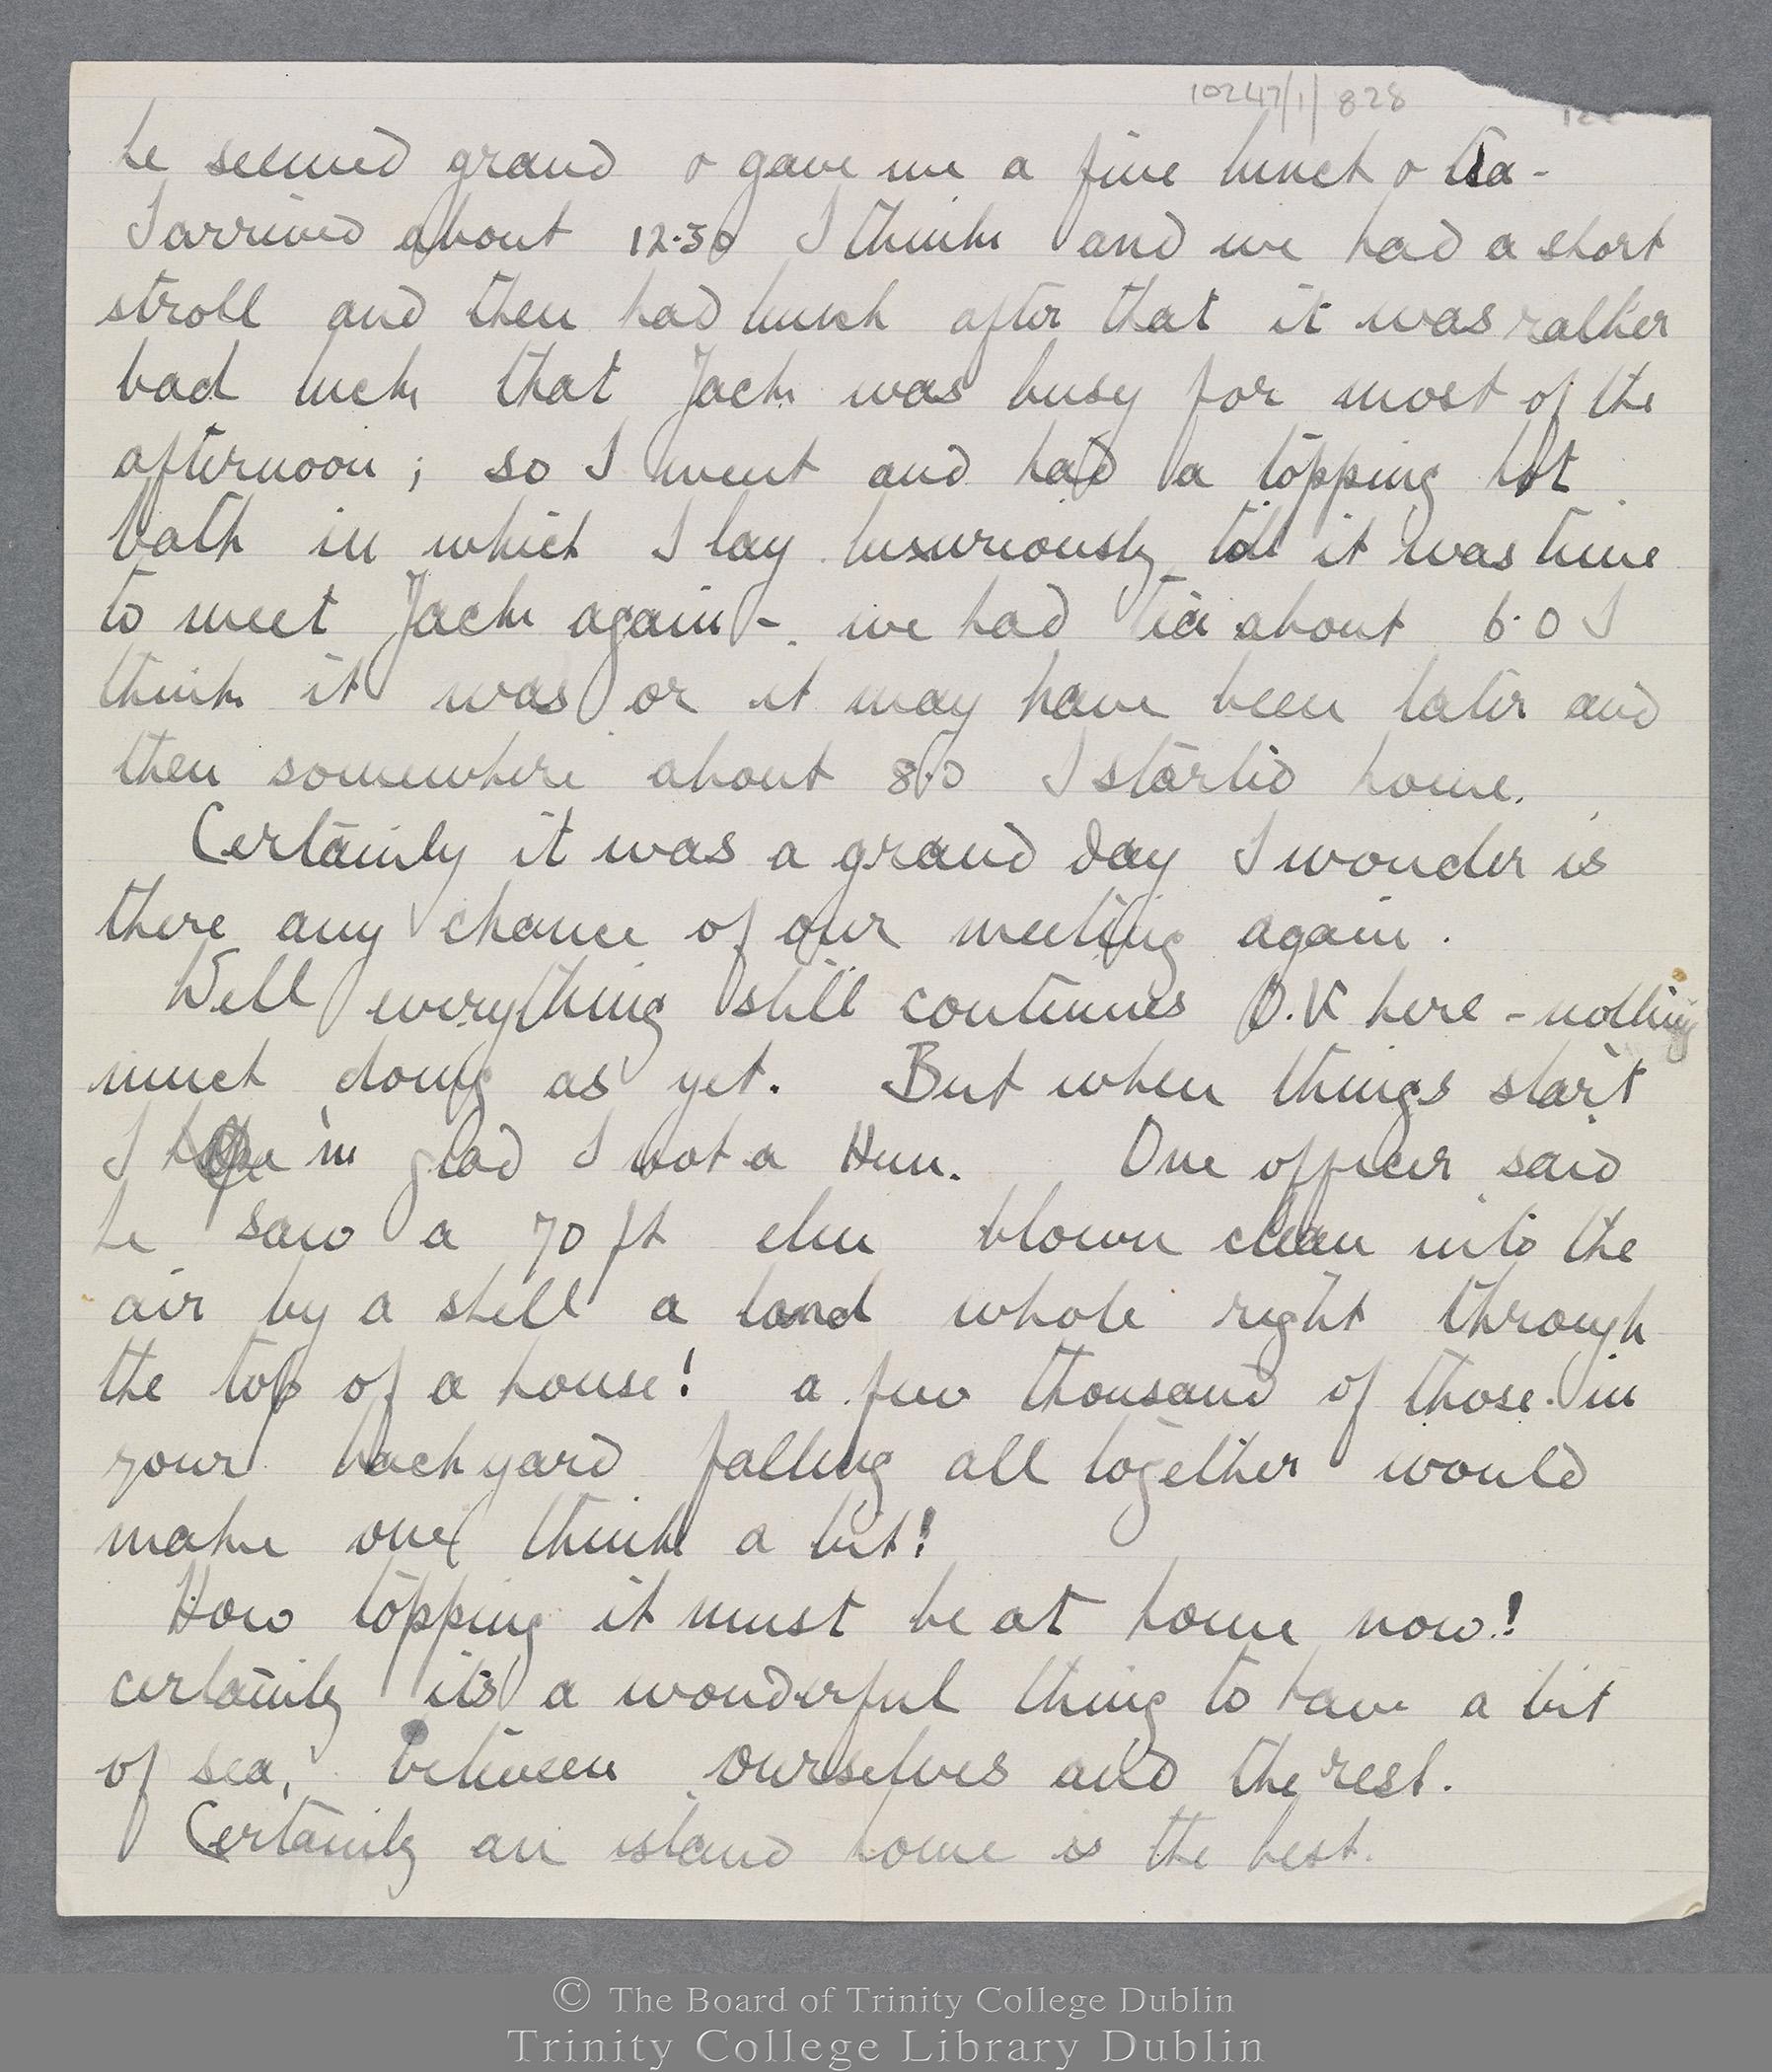 TCD MS 10247/1/828 folio 2 recto